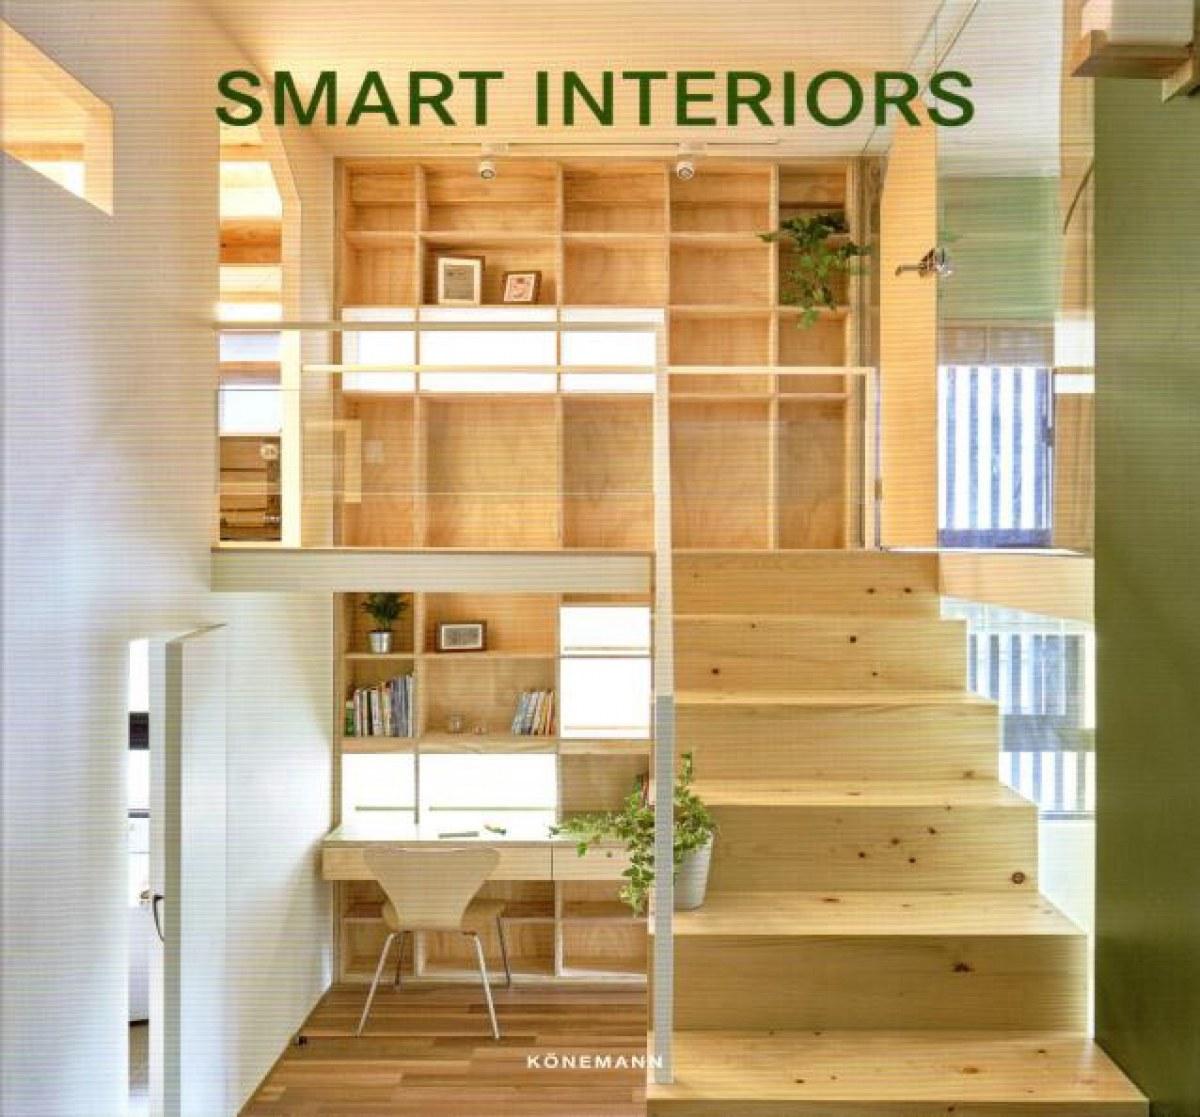 SMART &SMALL INTERIORS 9783741920851